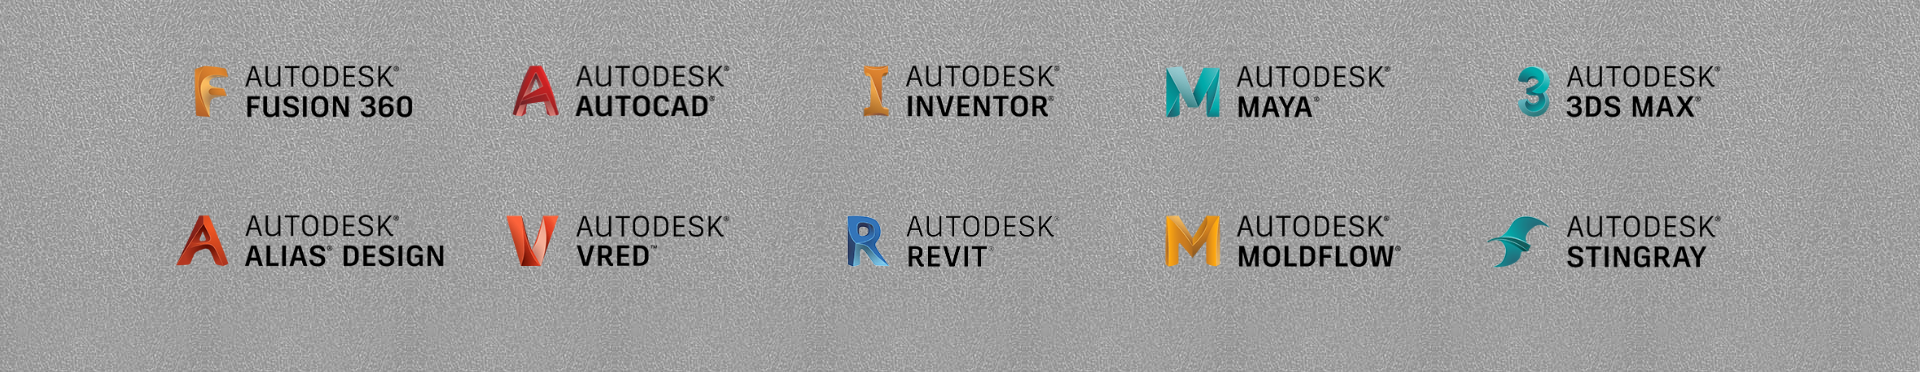 marcas autodesk